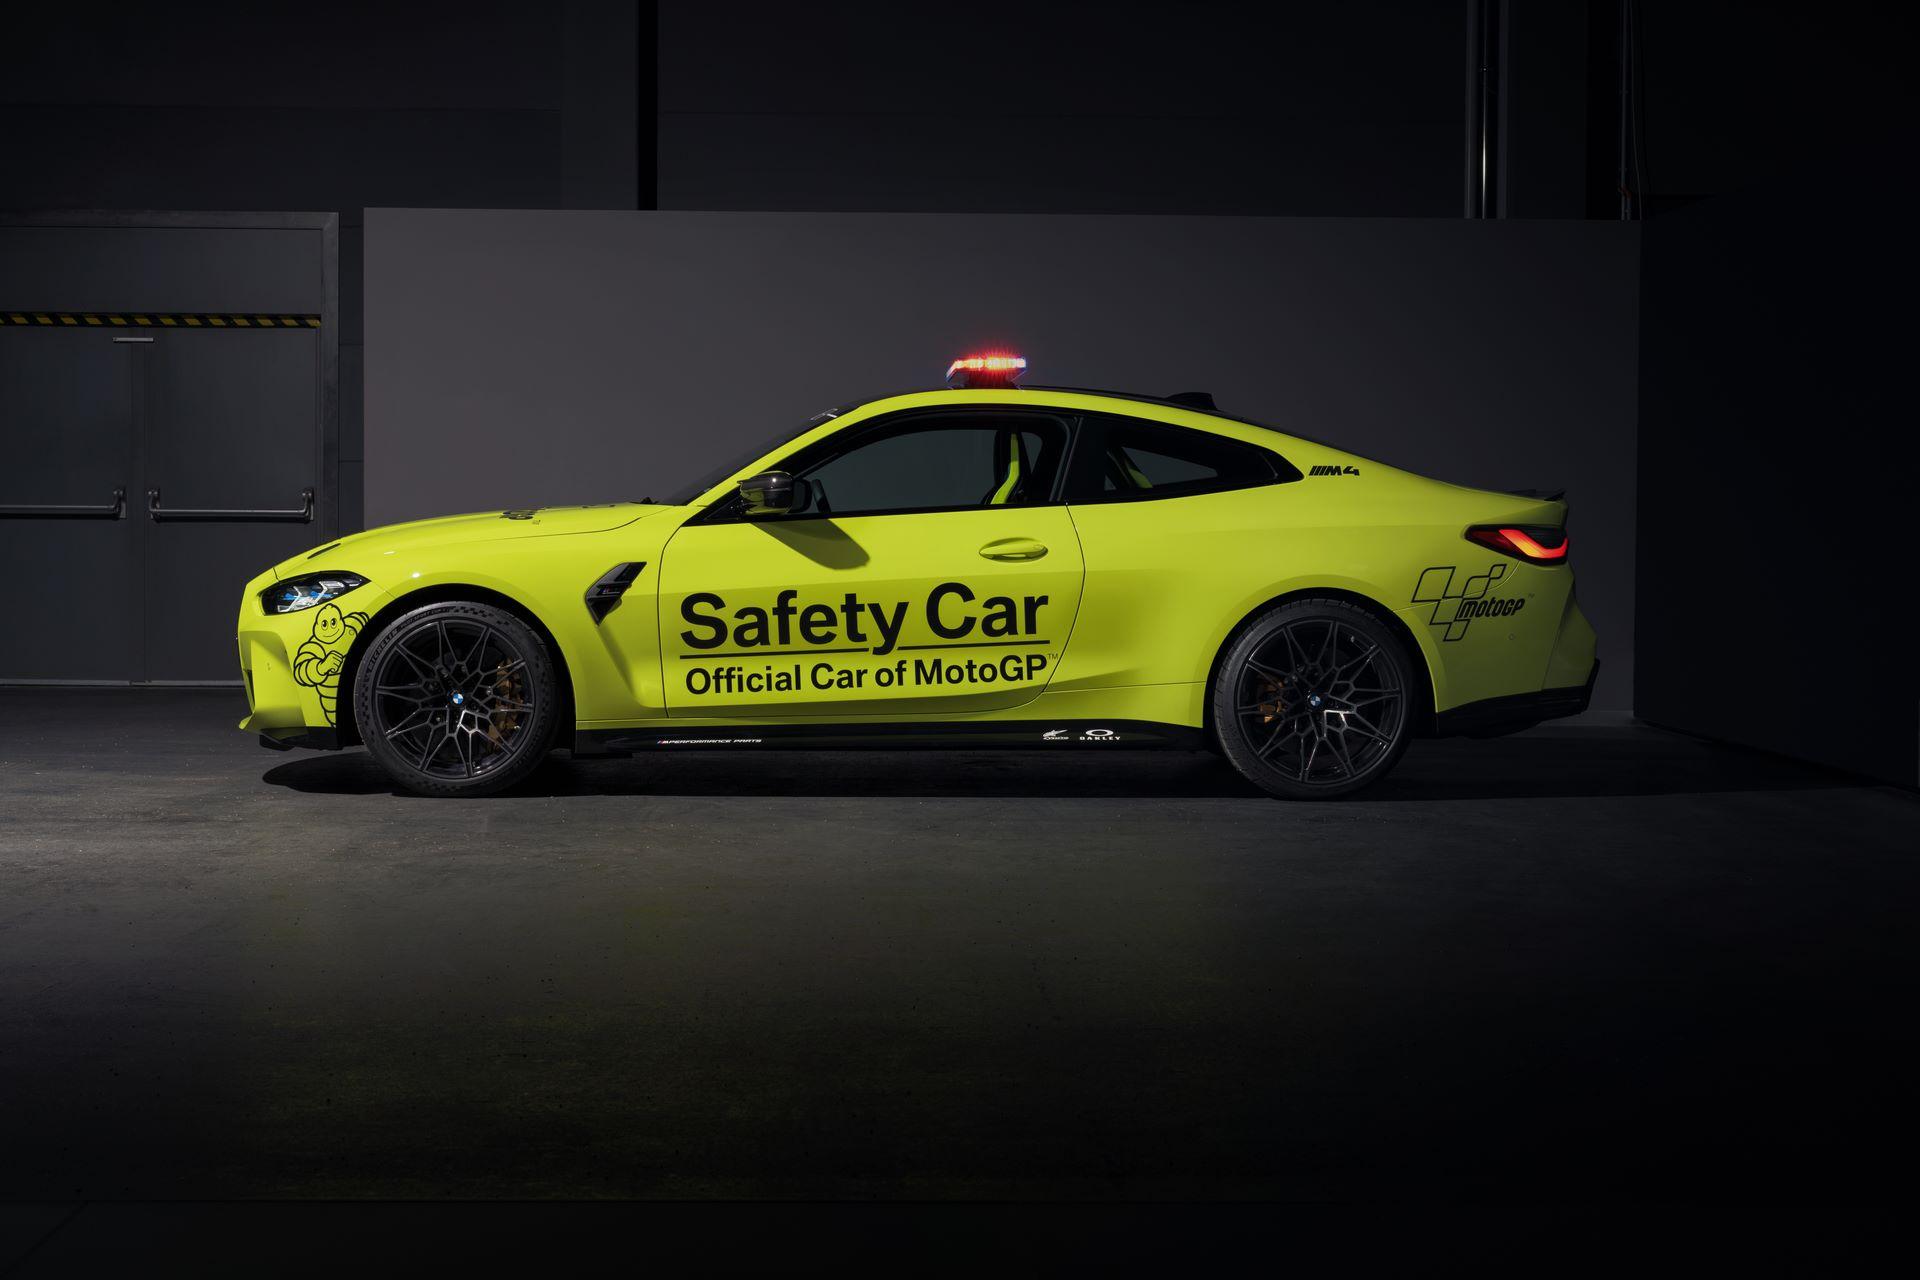 BMW-M3-M4-M5-CS-Safety-Cars-moto-gp-motogp-12